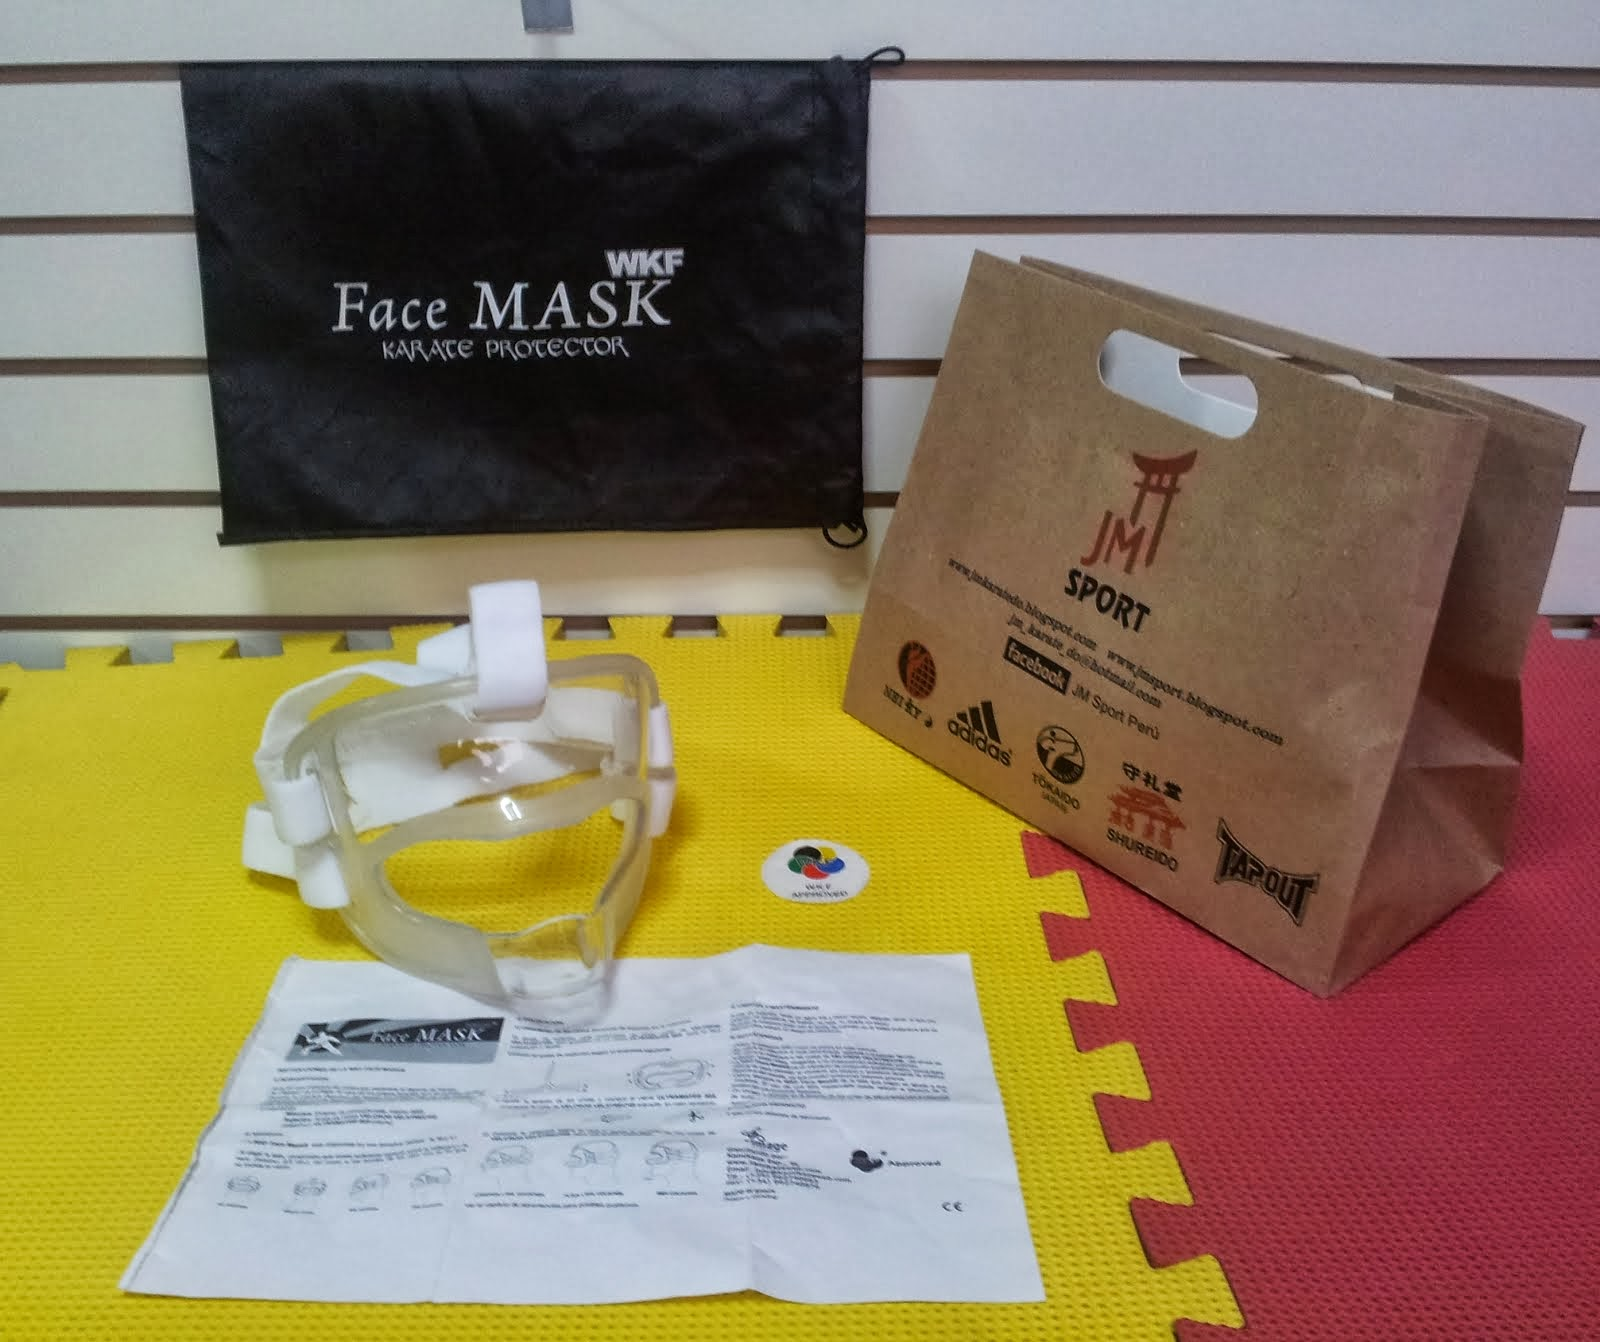 Mask Face WKF